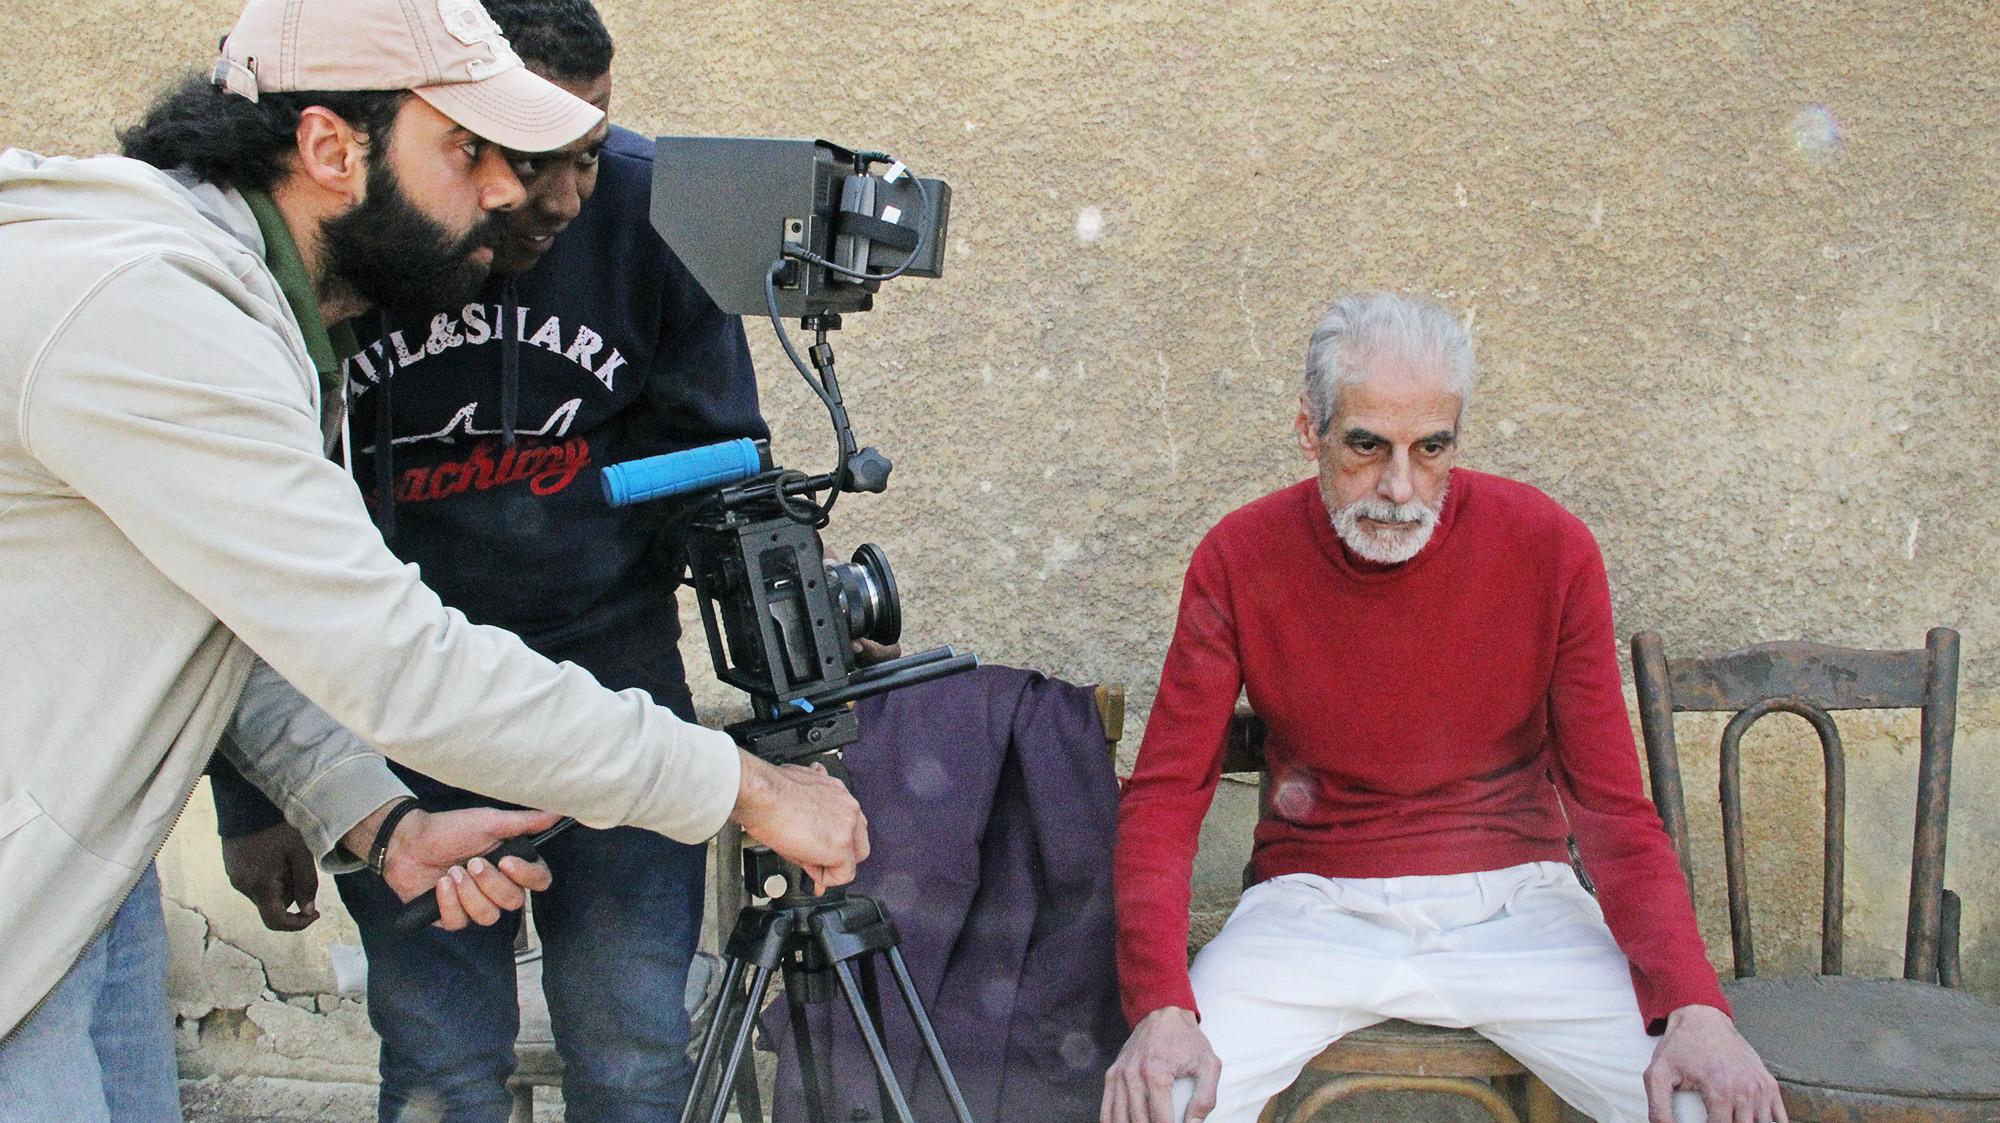 On-set shooting with Habby Khalil, Karim Shaaban and actor Mostafa Darwish. Courtesy of Karim Shaaban